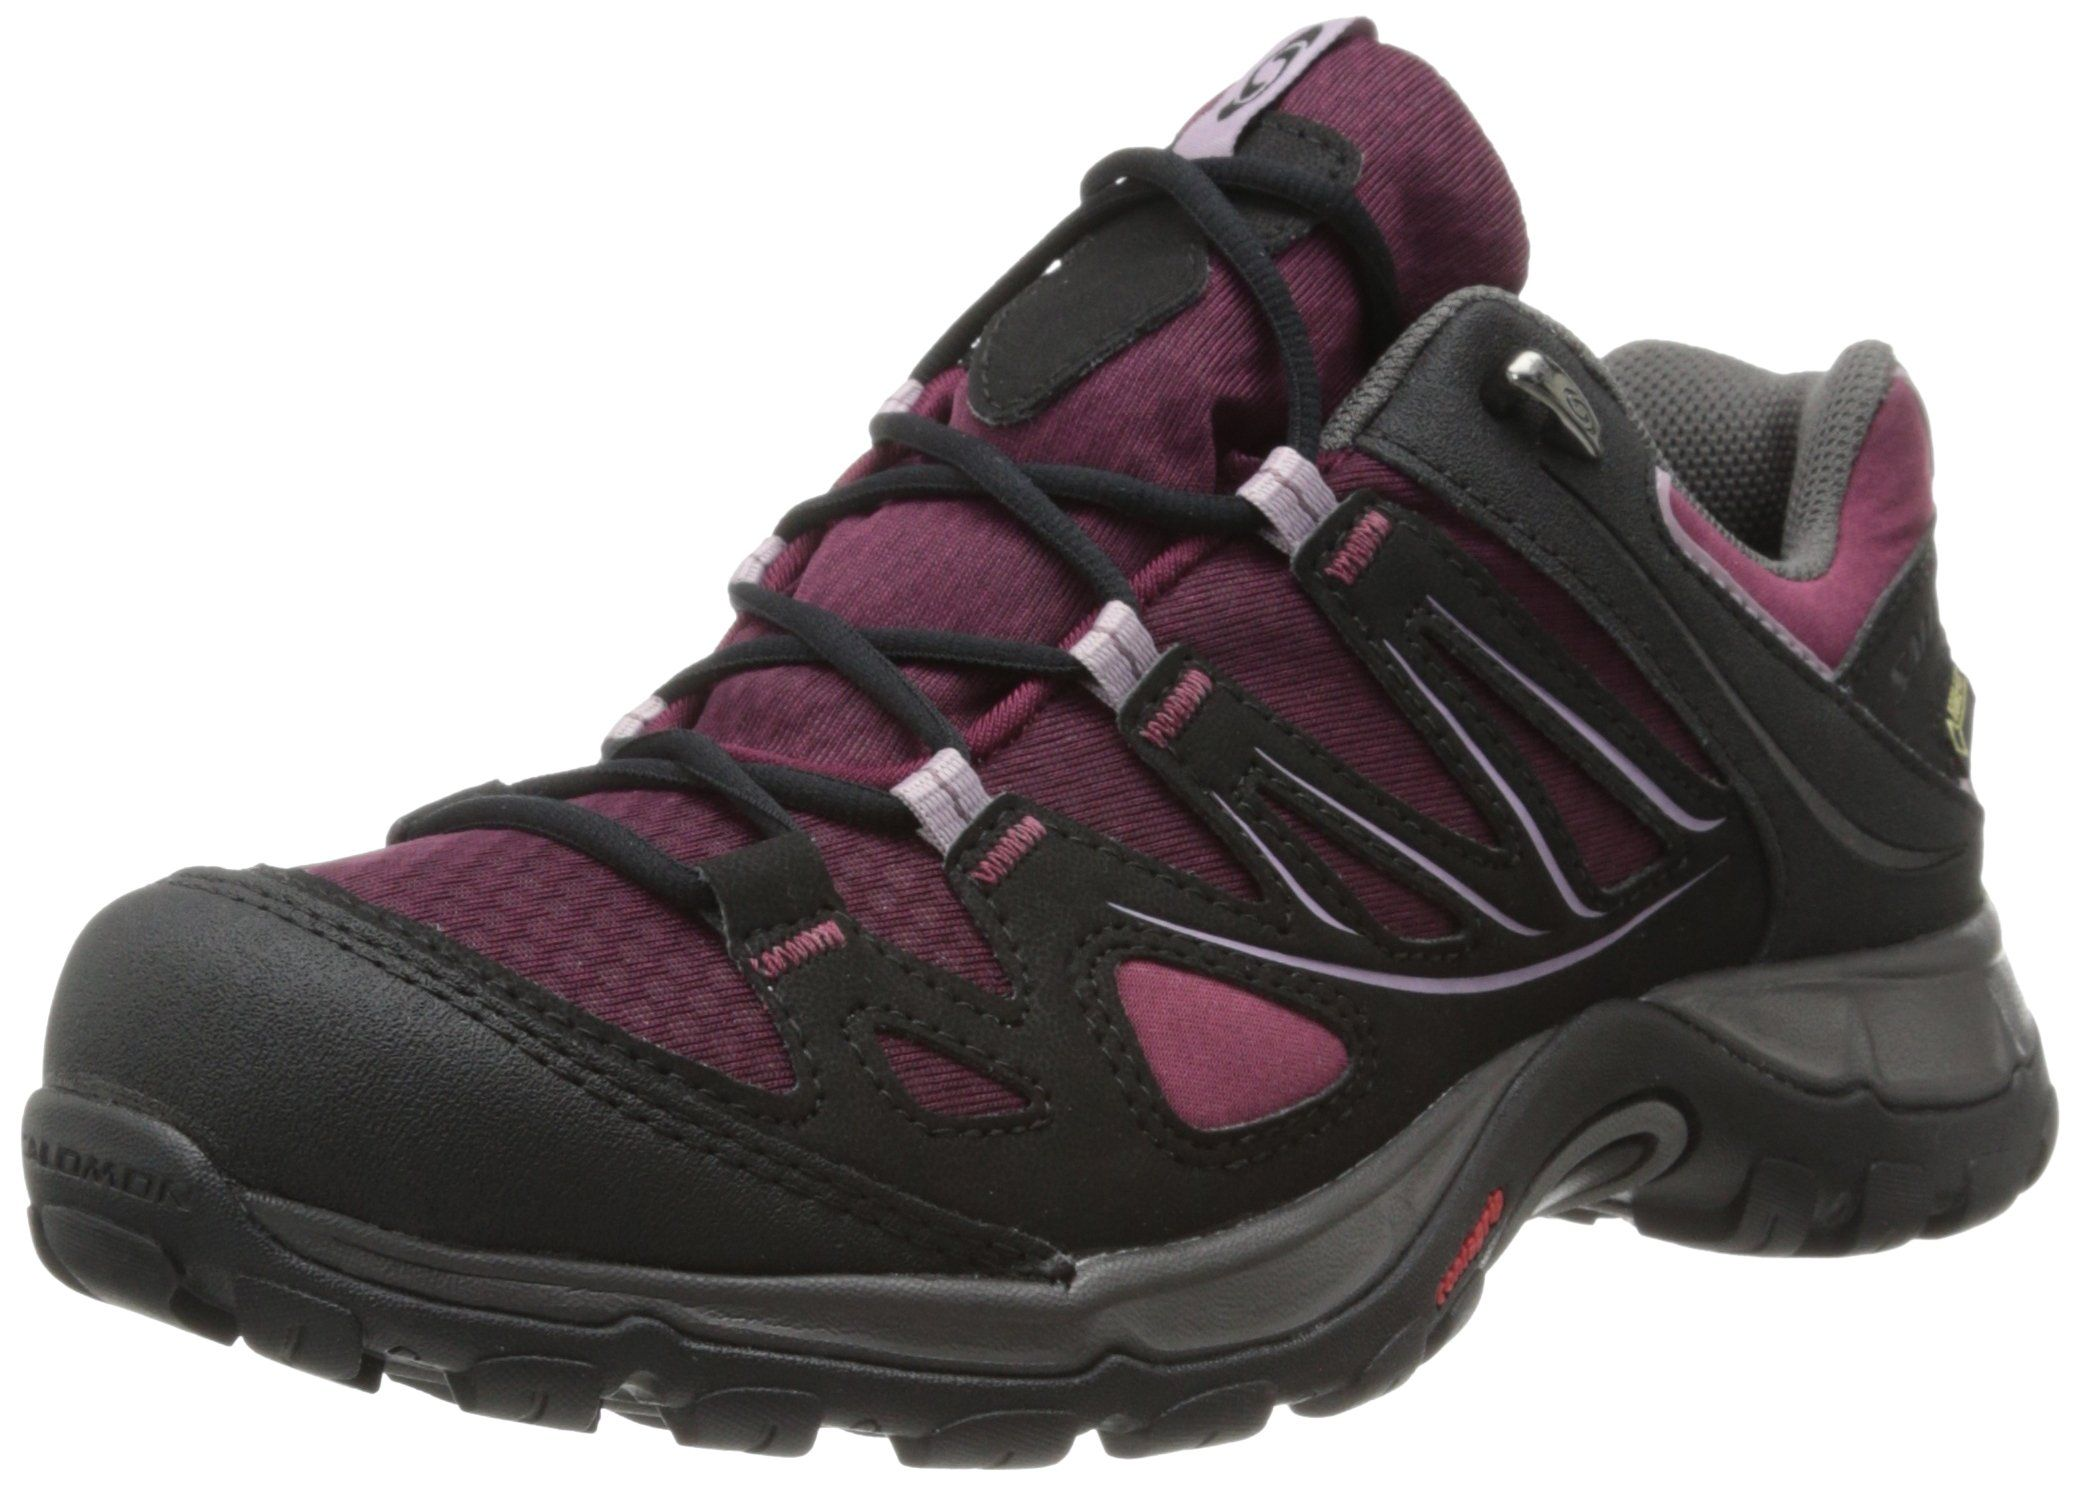 8c0121b9fdd BUY THIS ONE!!!!! Amazon.com: Salomon Women's Ellipse GTX Hiking ...